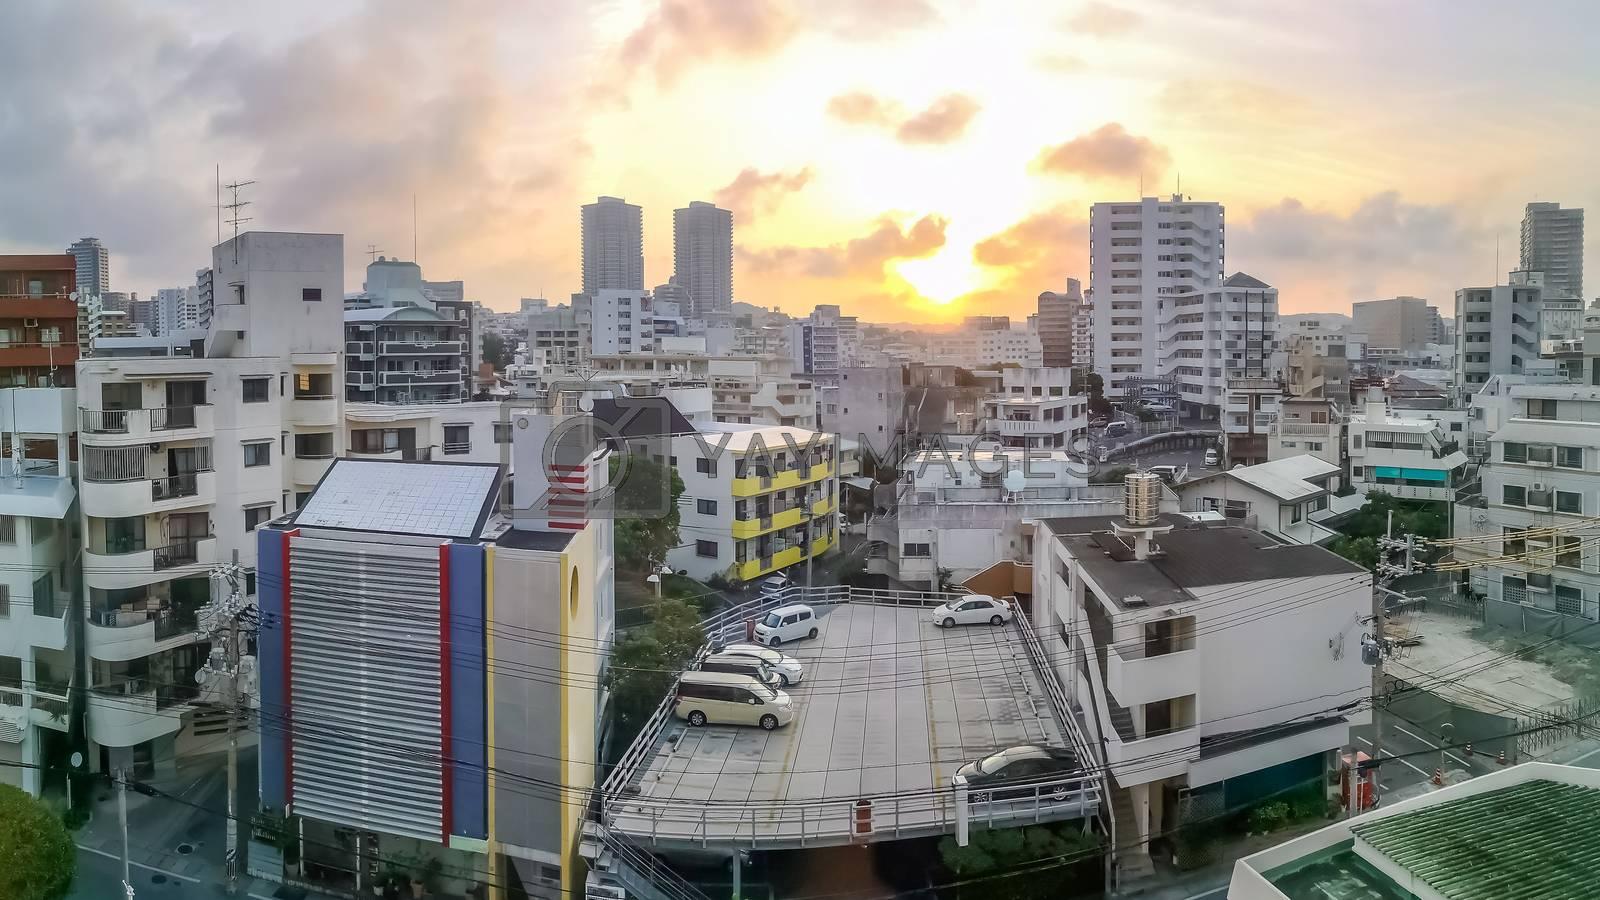 Downtown Naha city skyline in Okinawa, Japan at sunrise